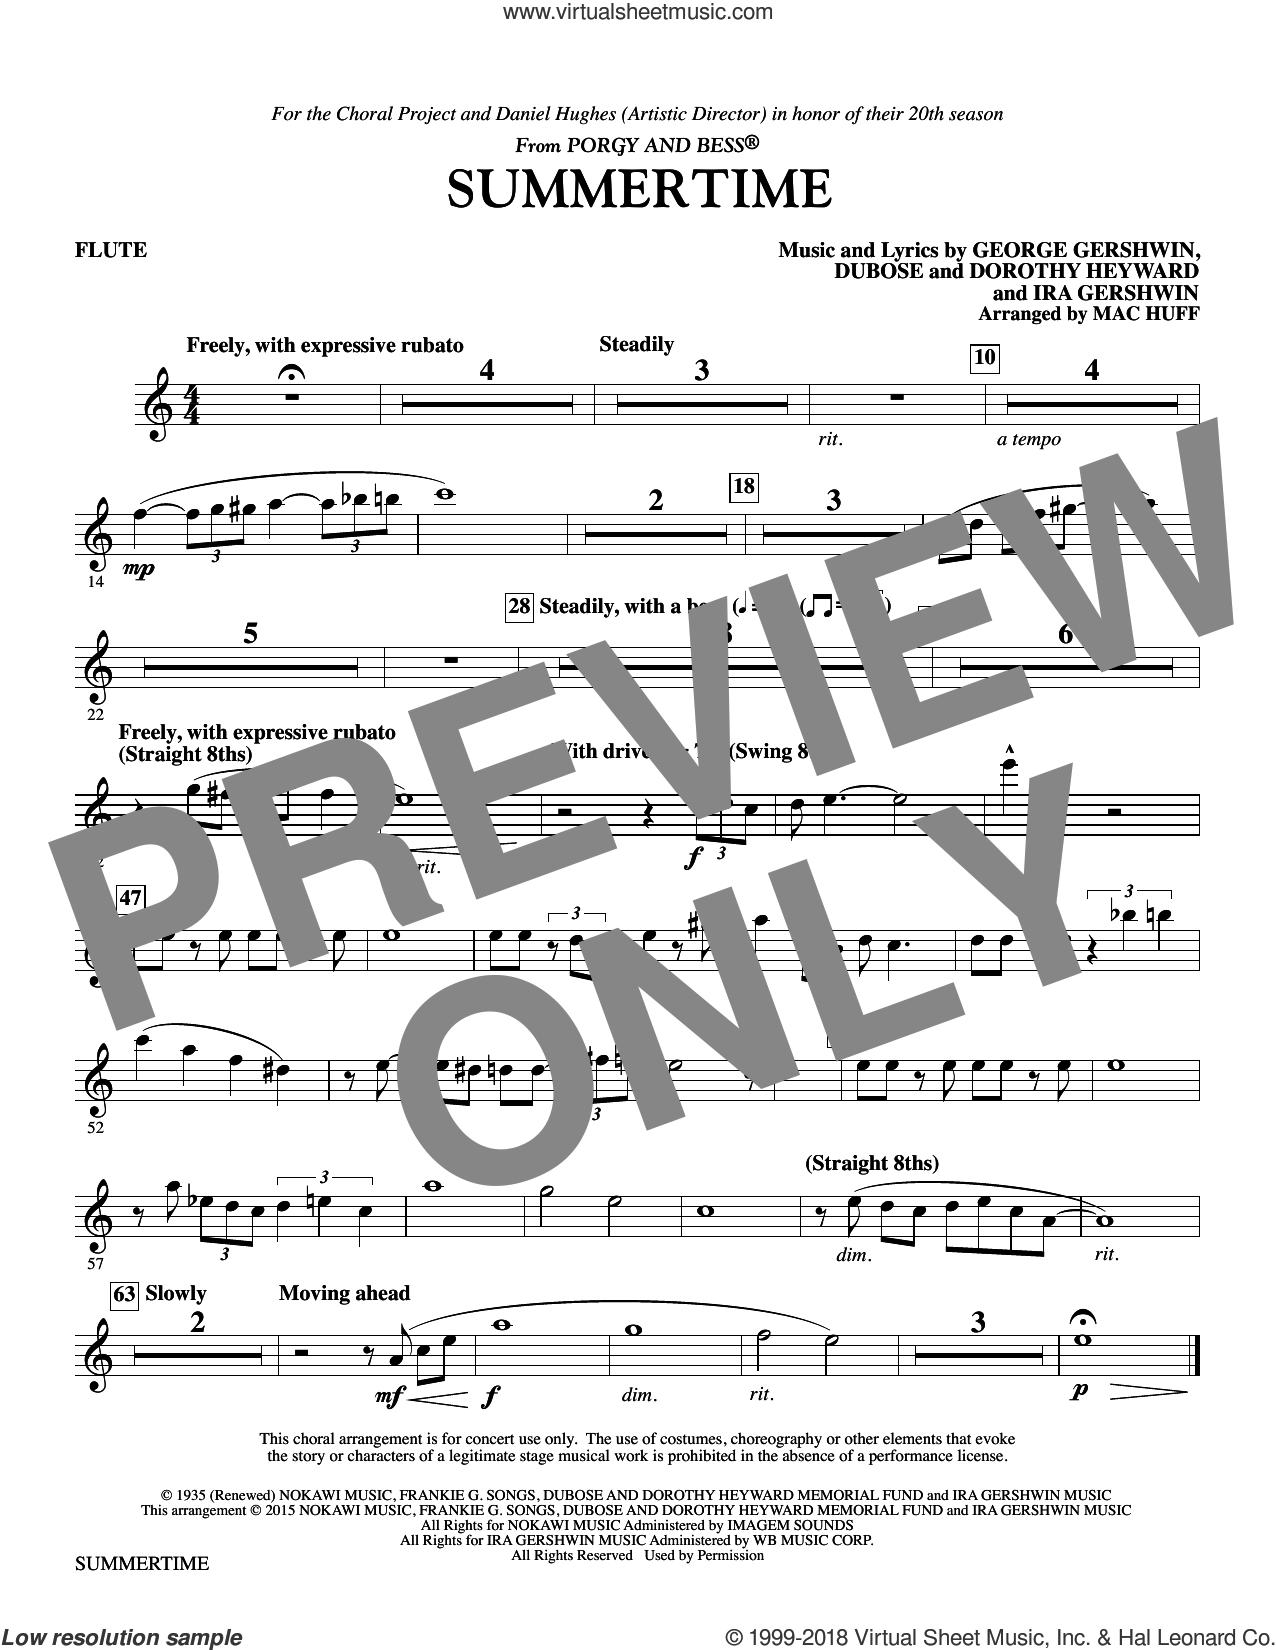 Summertime (arr. Mac Huff) (complete set of parts) sheet music for orchestra/band by George Gershwin, Dorothy Heyward, DuBose Heyward, Ira Gershwin and Mac Huff, intermediate skill level